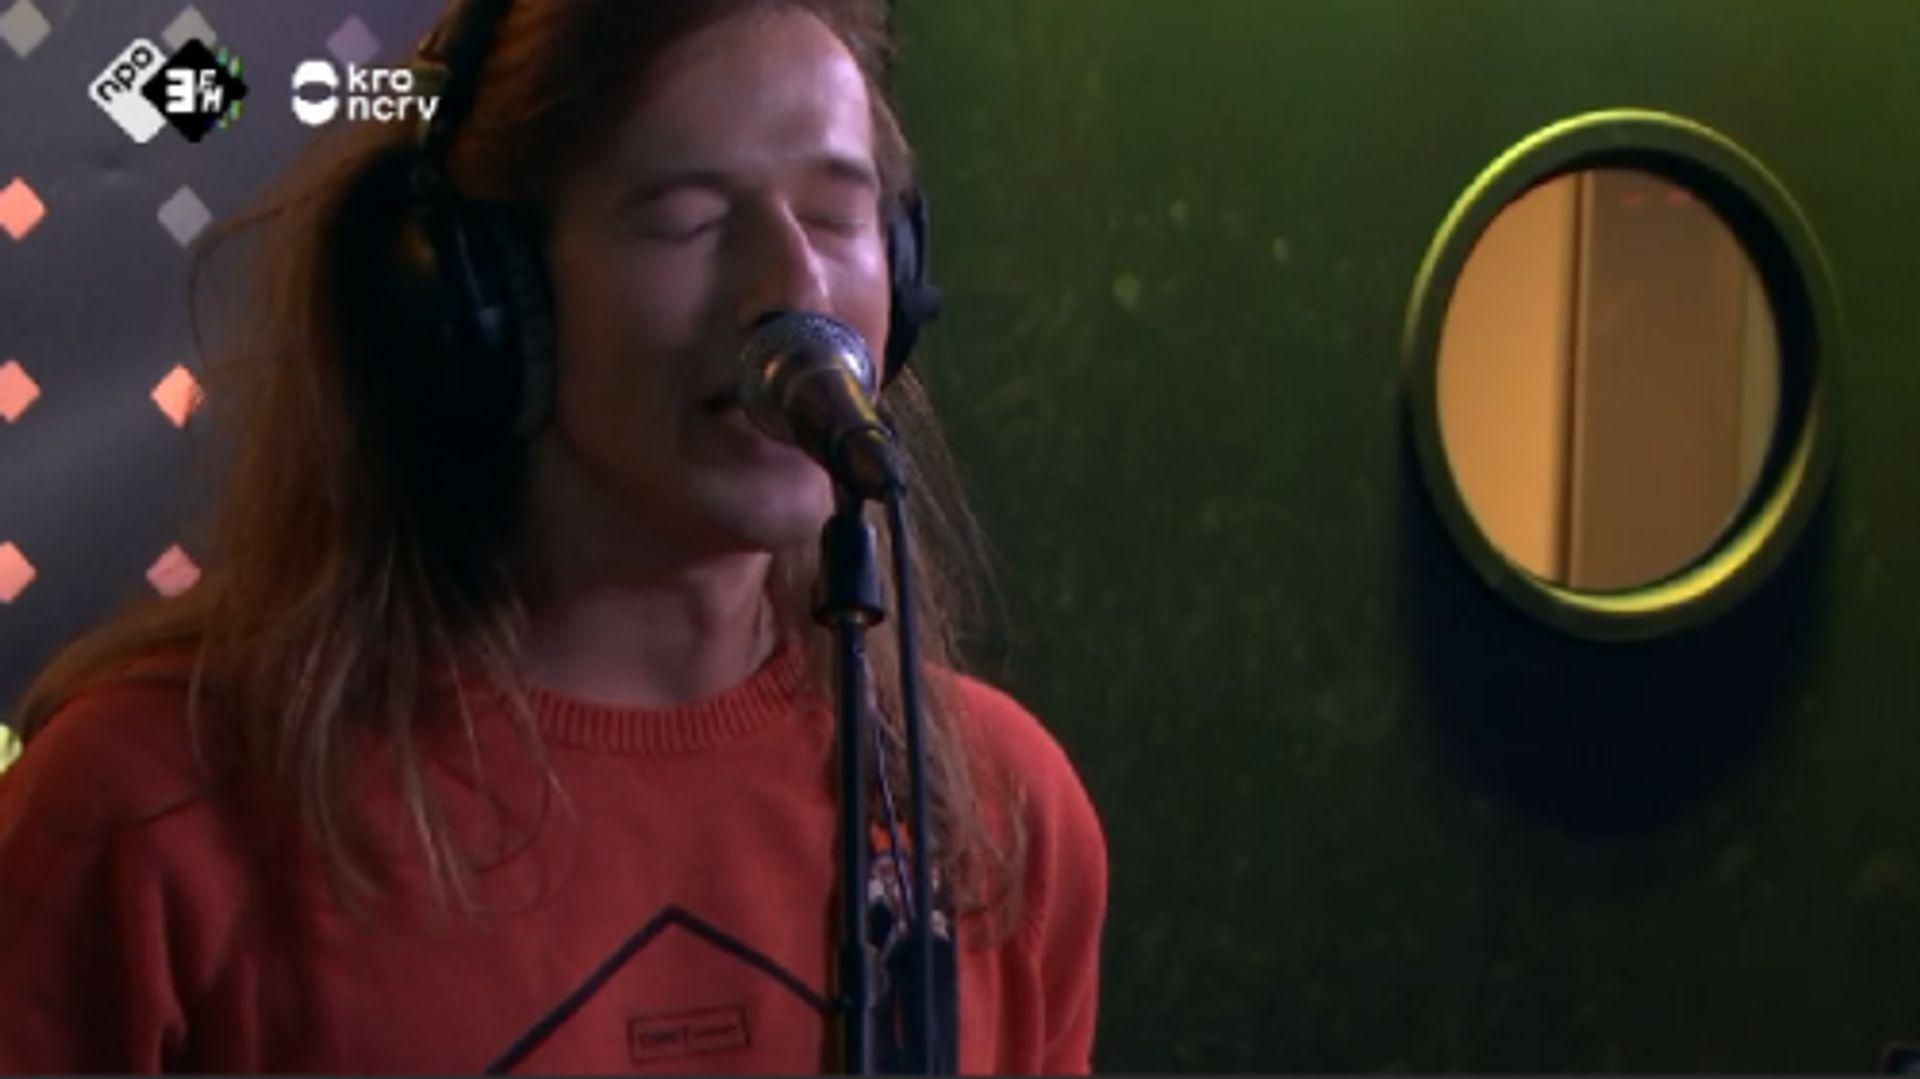 Baggio - Mrs. Claus (LIVE @ KEVIN) #3FM #livemuziek #talent